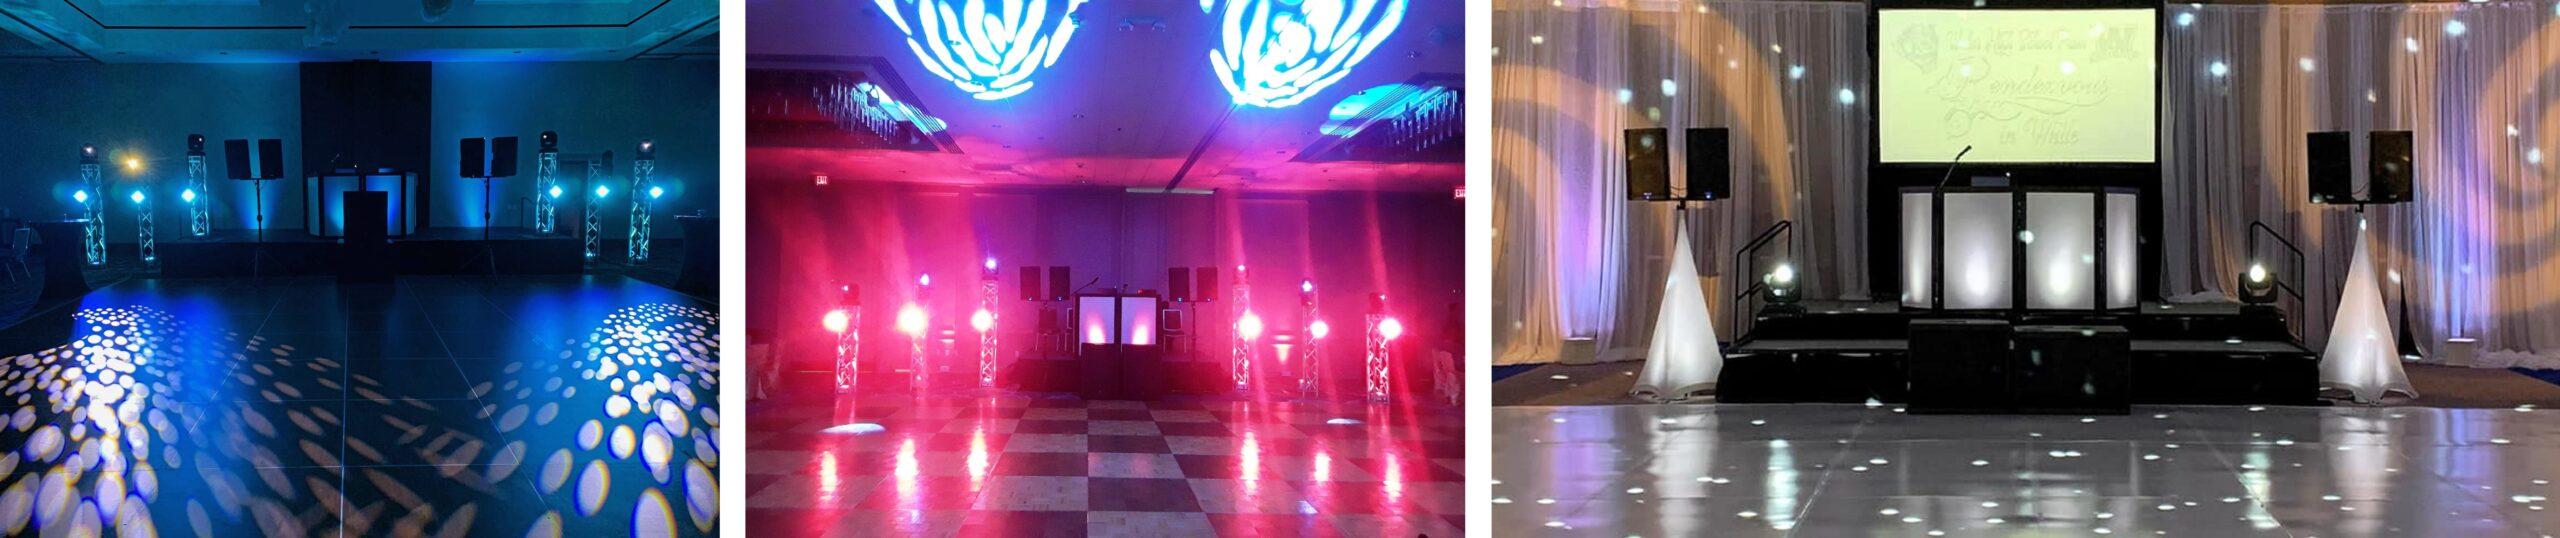 Houston DJ, DJs in Houston, Houston Prom DJ, Houston School Dance, Houston Homecoming Dance DJ, Club Lighting, Awesome Music Entertainment, Awesome Event Pros, AME DJs